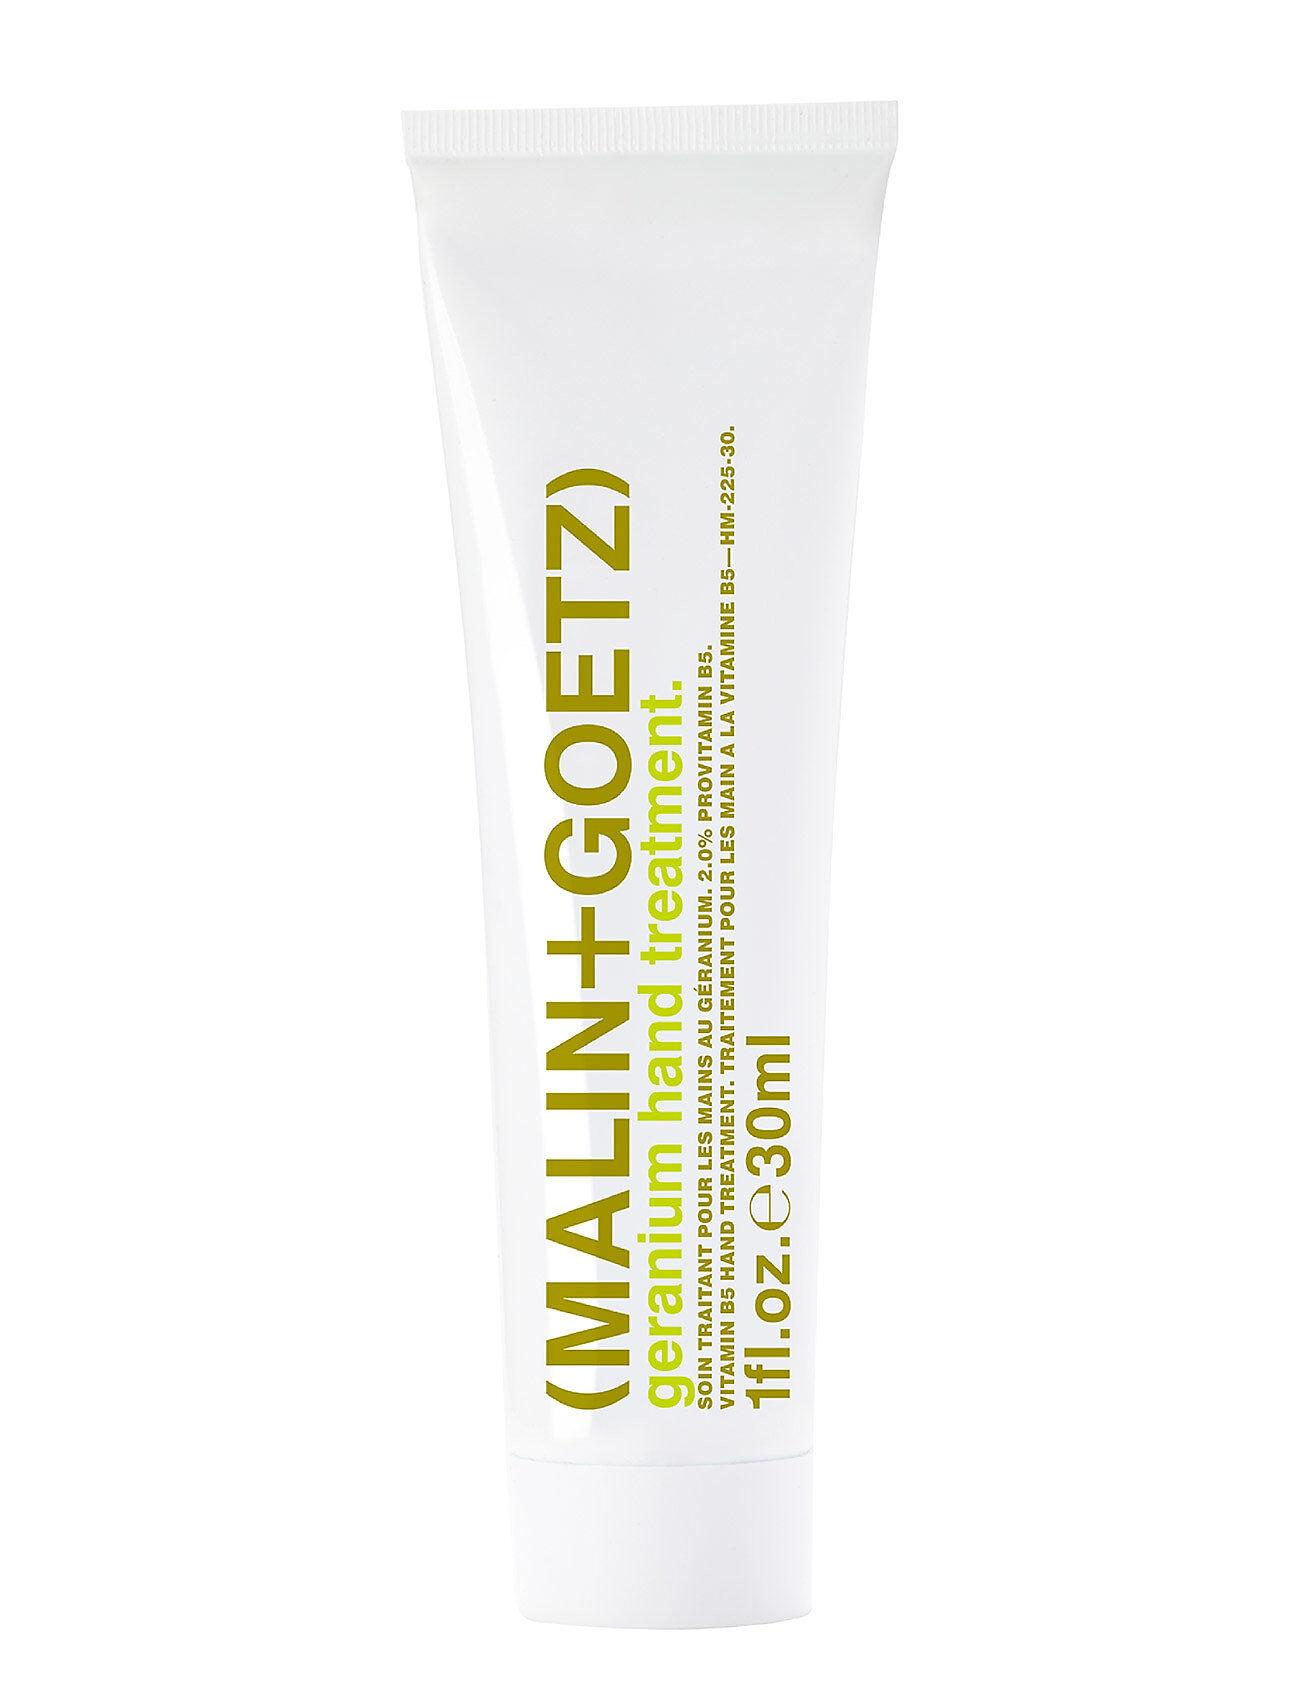 MALIN+GOETZ Geranium Hand Treatment Kosteusvoide Vartalo Nude MALIN+GOETZ